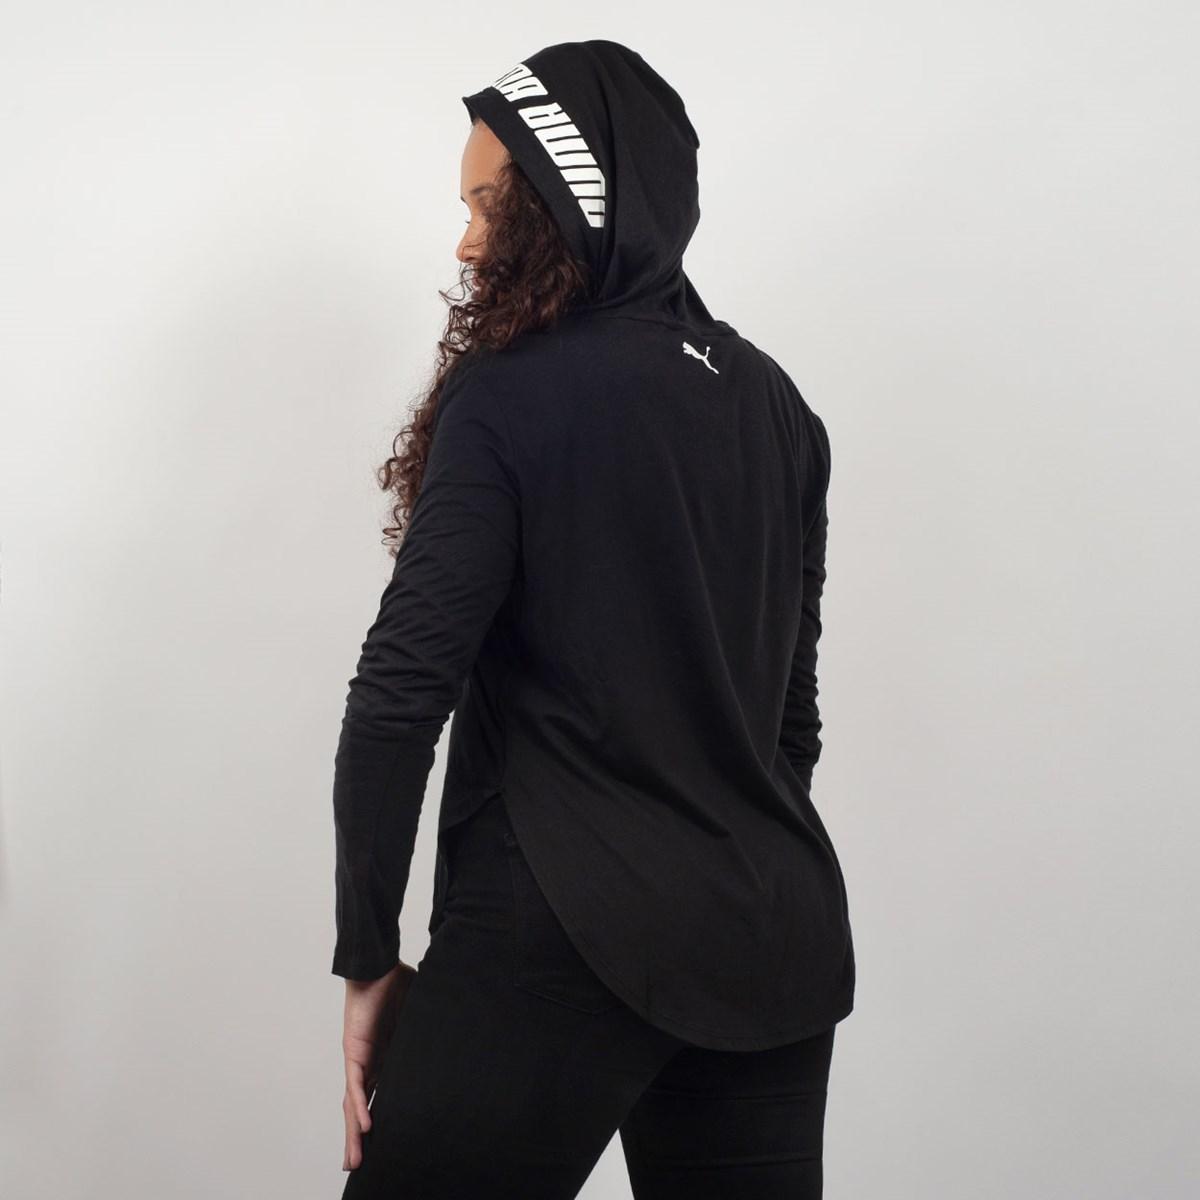 Camiseta Puma Feminina Manga Longa Capuz Modern Sports Light Cover Up Preto 85423501 Black